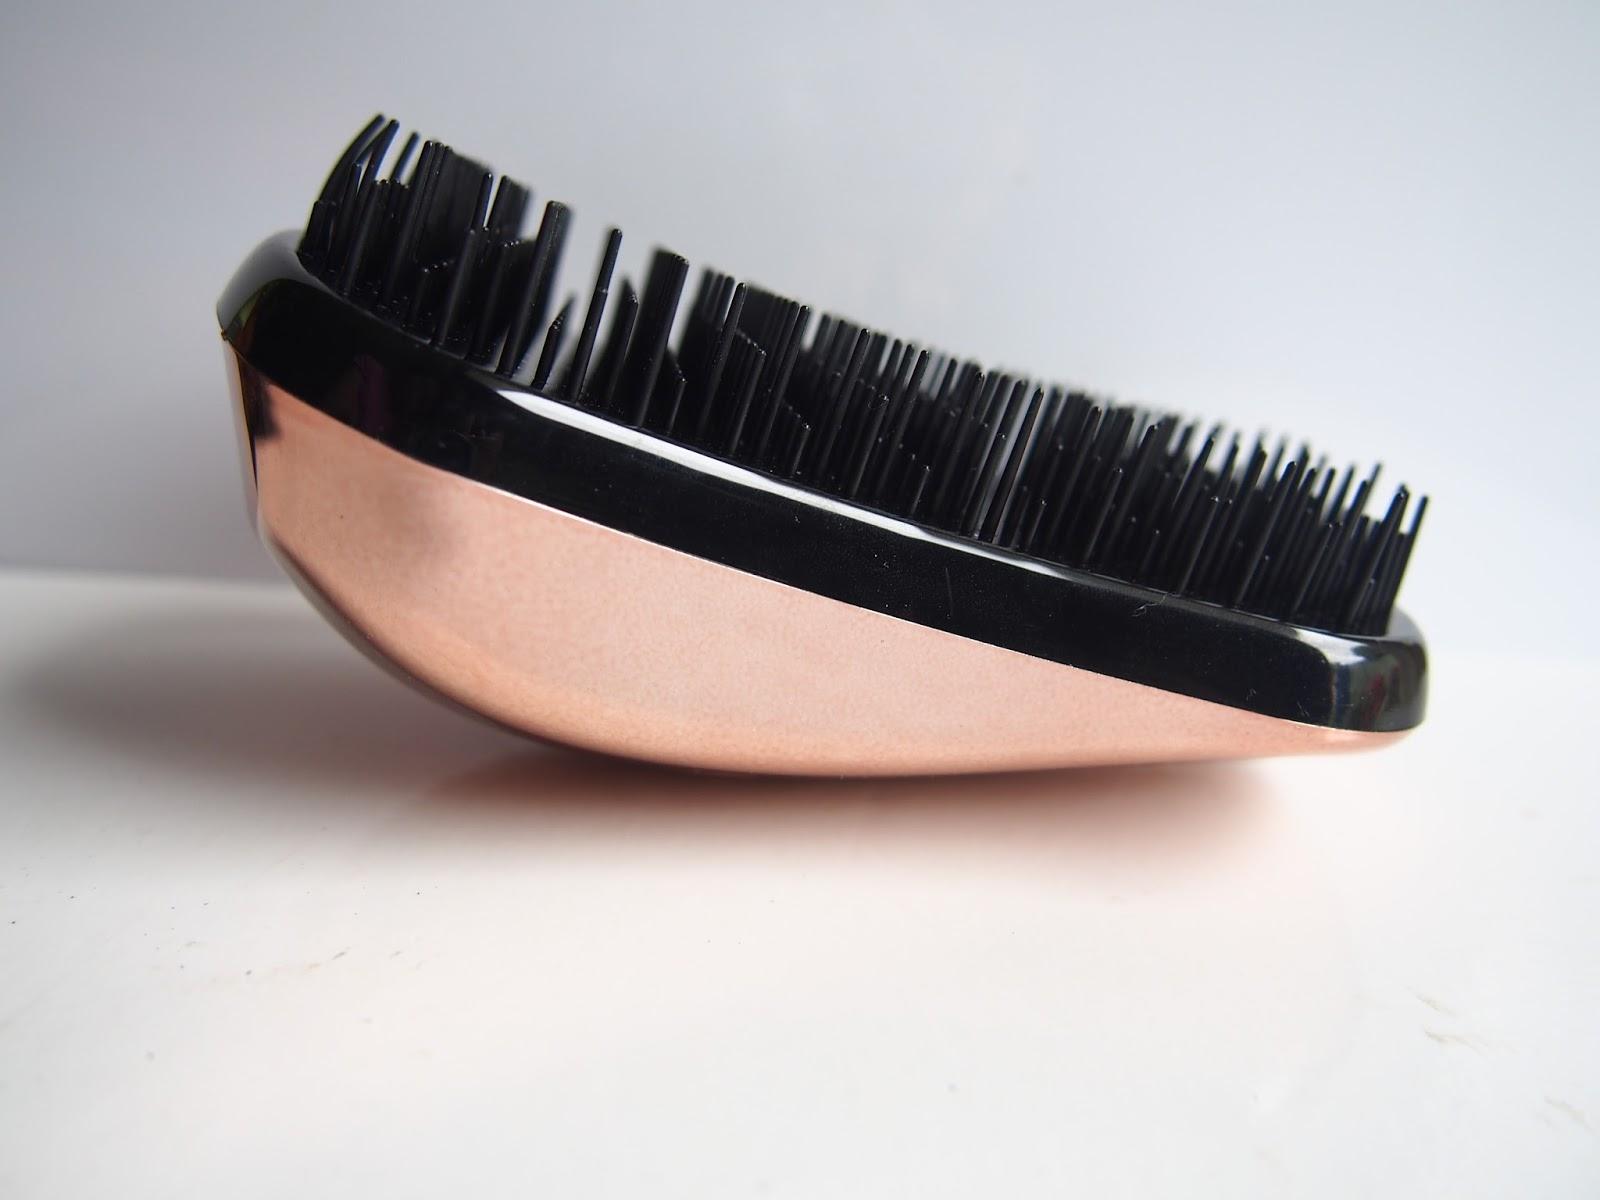 Dessata Rose Gold Hair Brush Review Demo